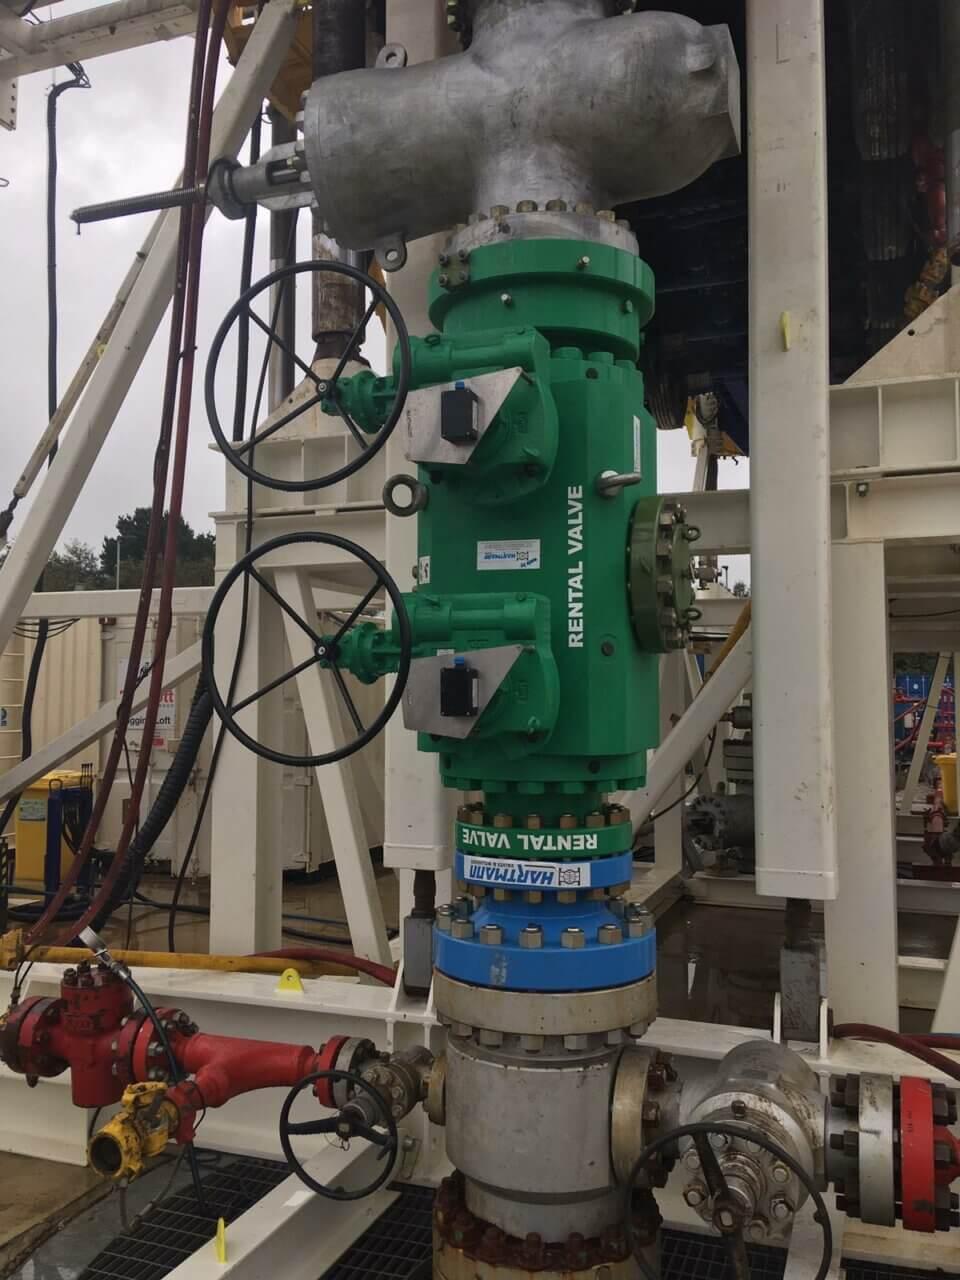 Hartmann Twin Ball Valve API 6A rental equipment gastight metal-to-metal sealing geothermal